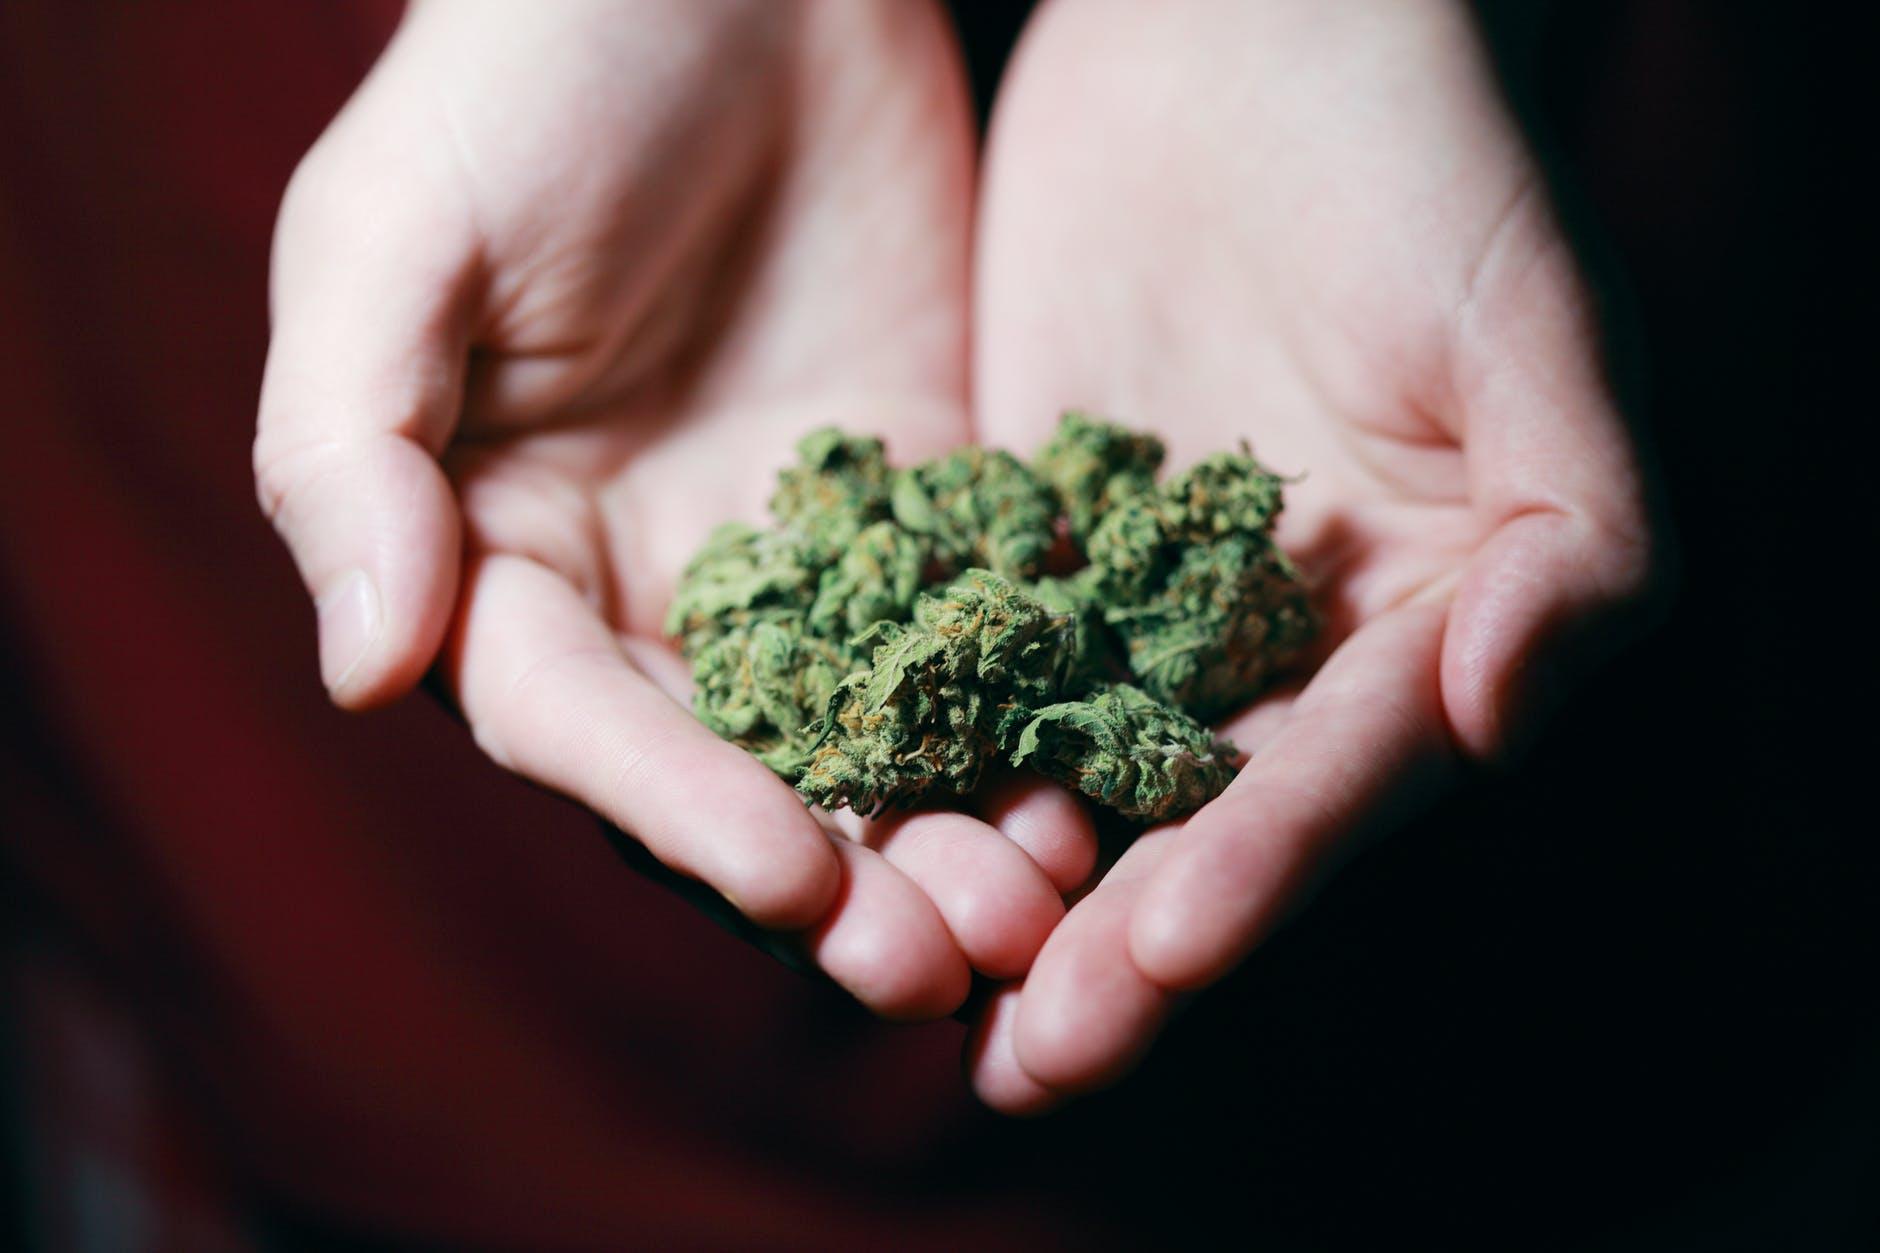 Medical cannabis - Cannabis industry